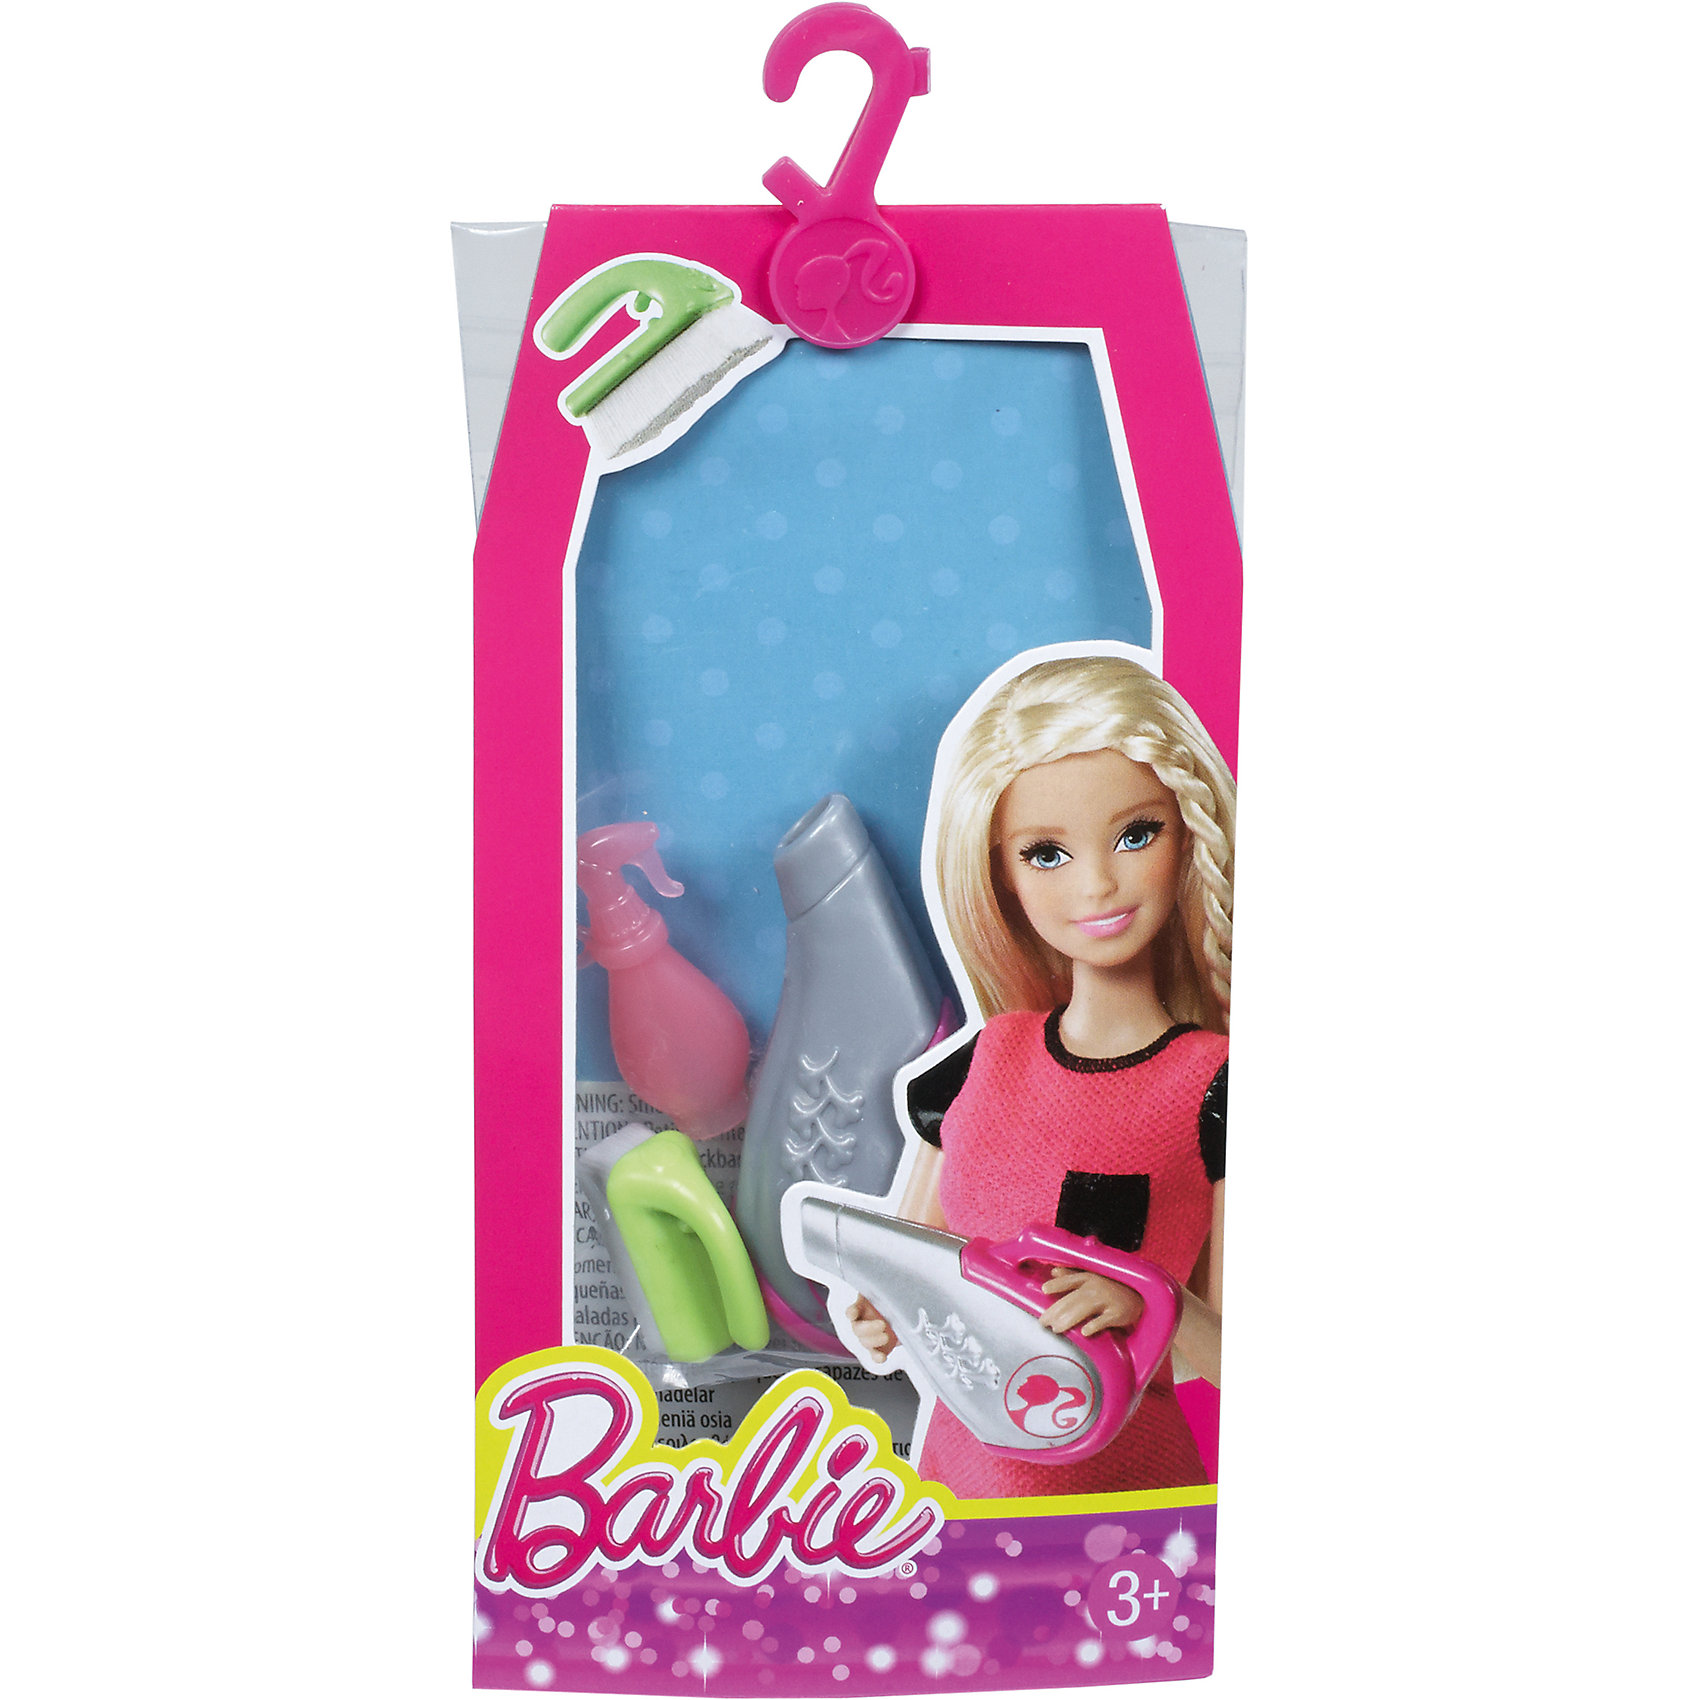 Barbie мини-наборы для декора barbie